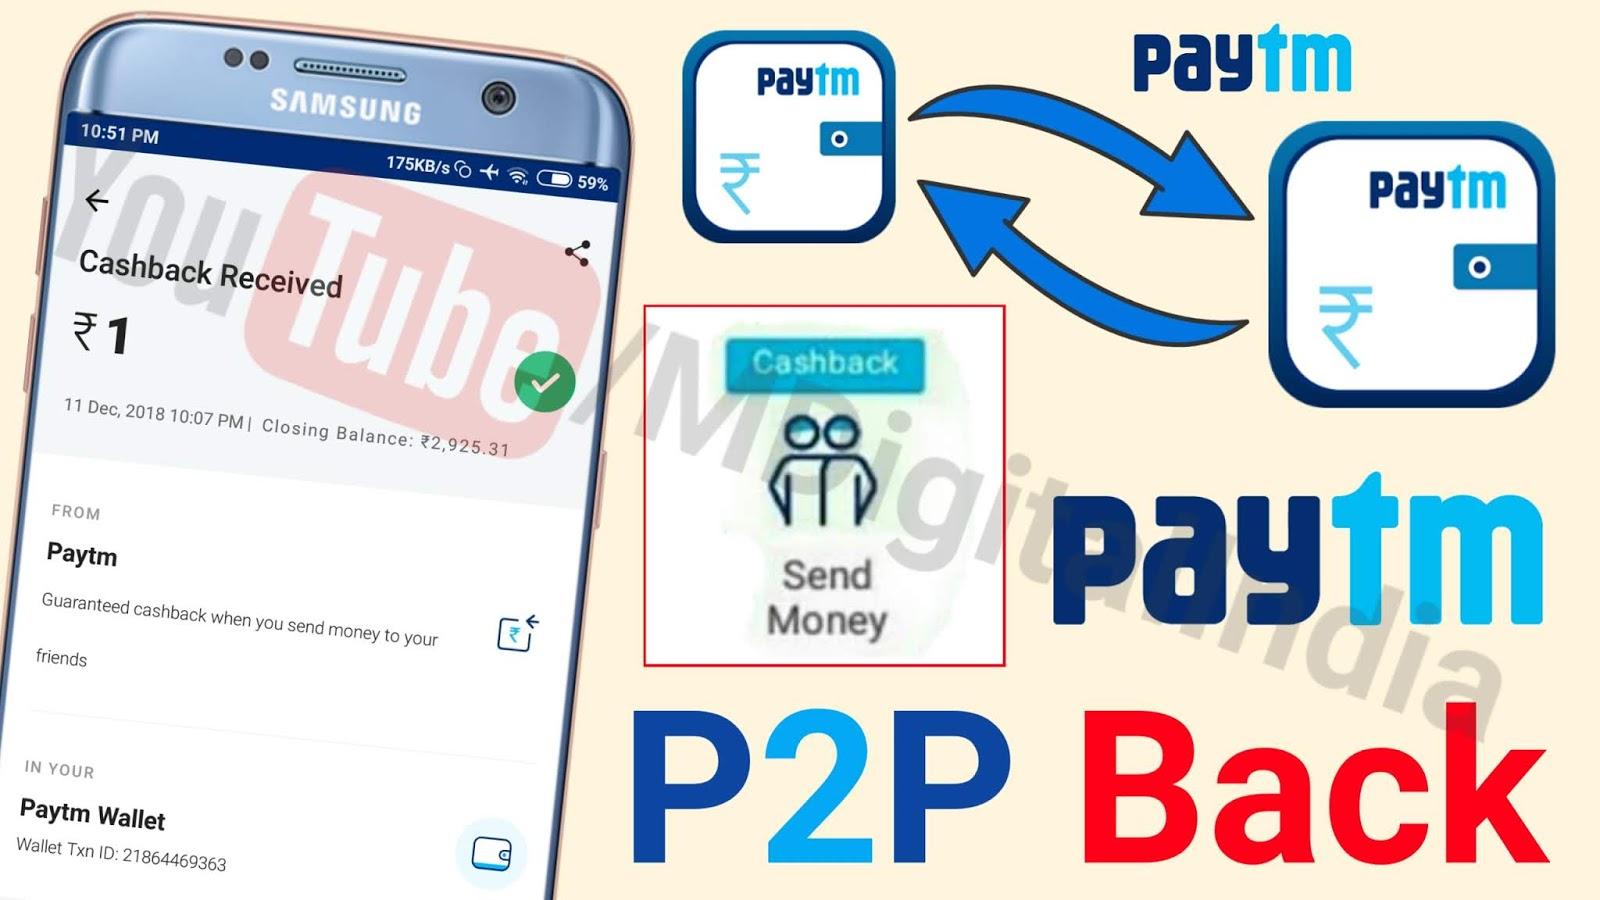 Paytm new P2P Offer back - M Digital India